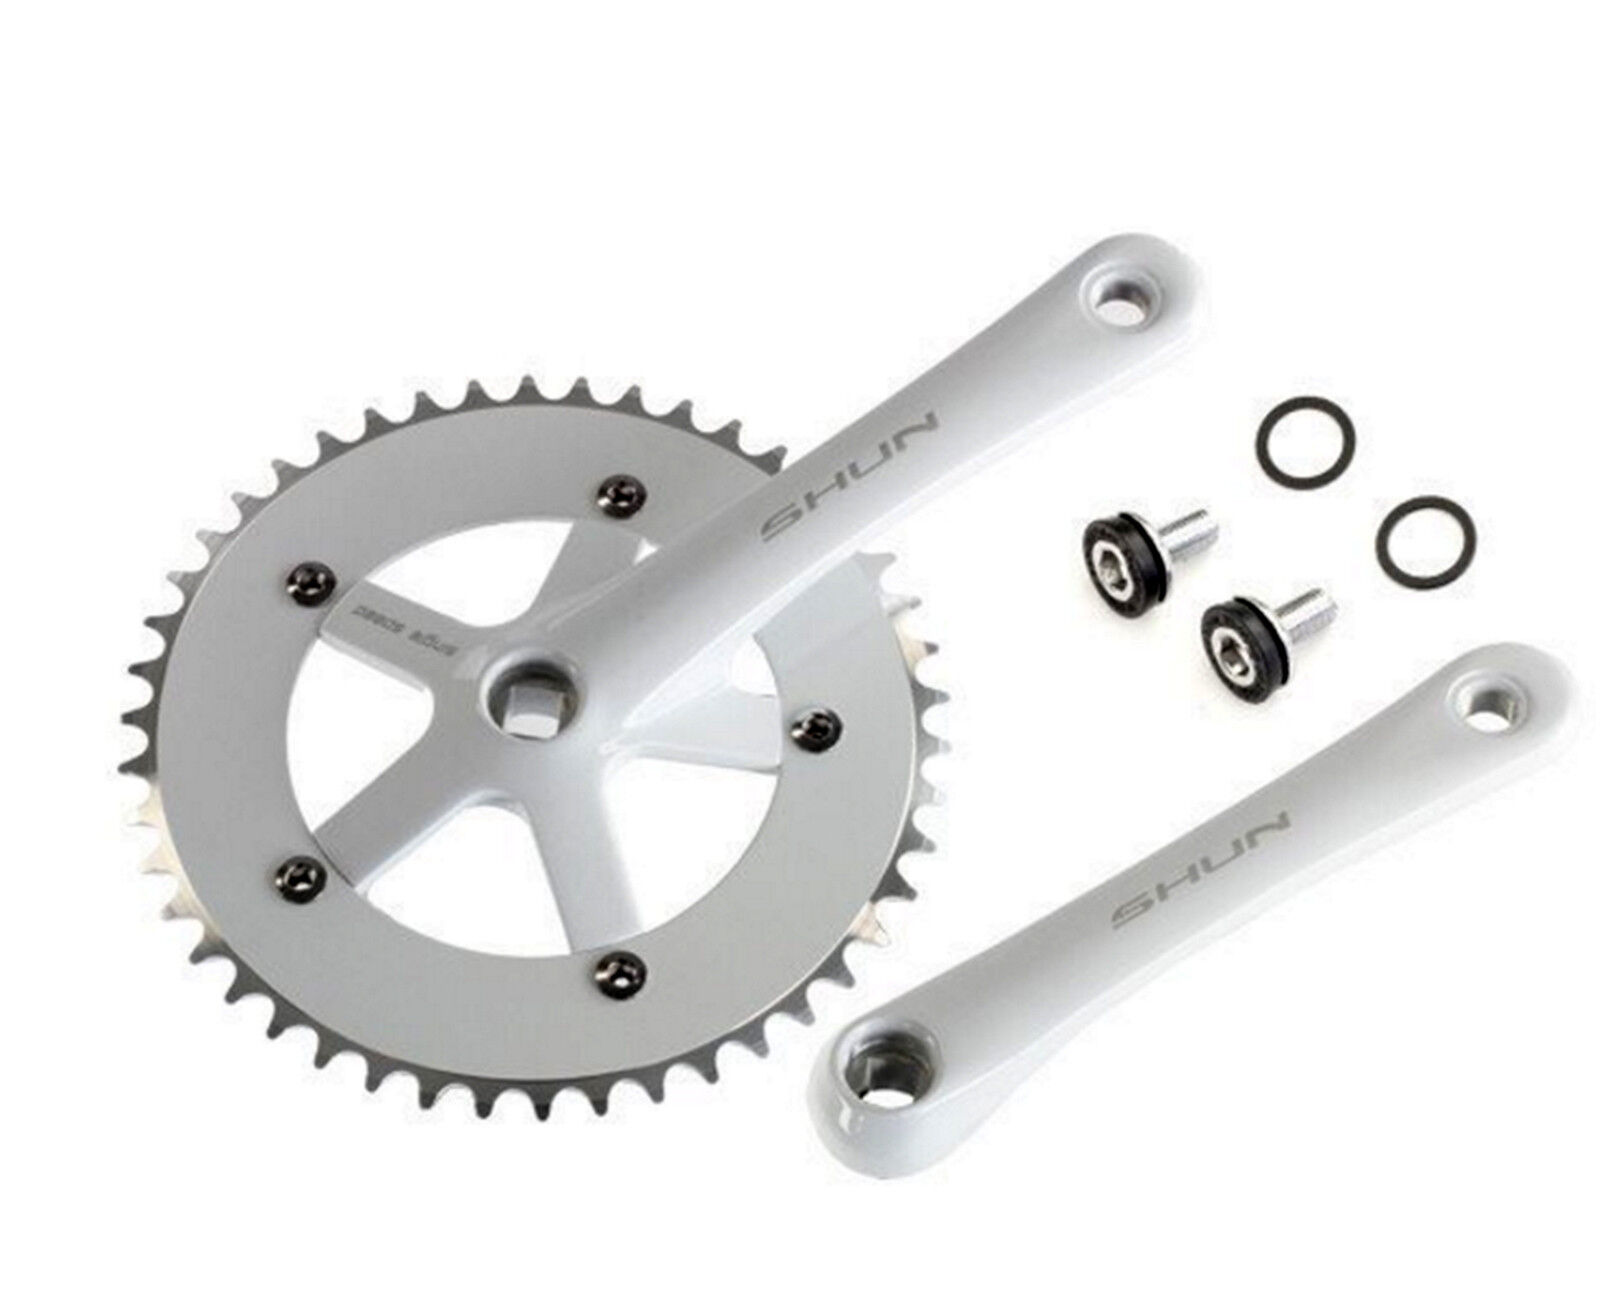 Plato y Bielas blancoooO Aluminio CNC Bicicleta Fixie Singlespeed 165 x 46 T 3742